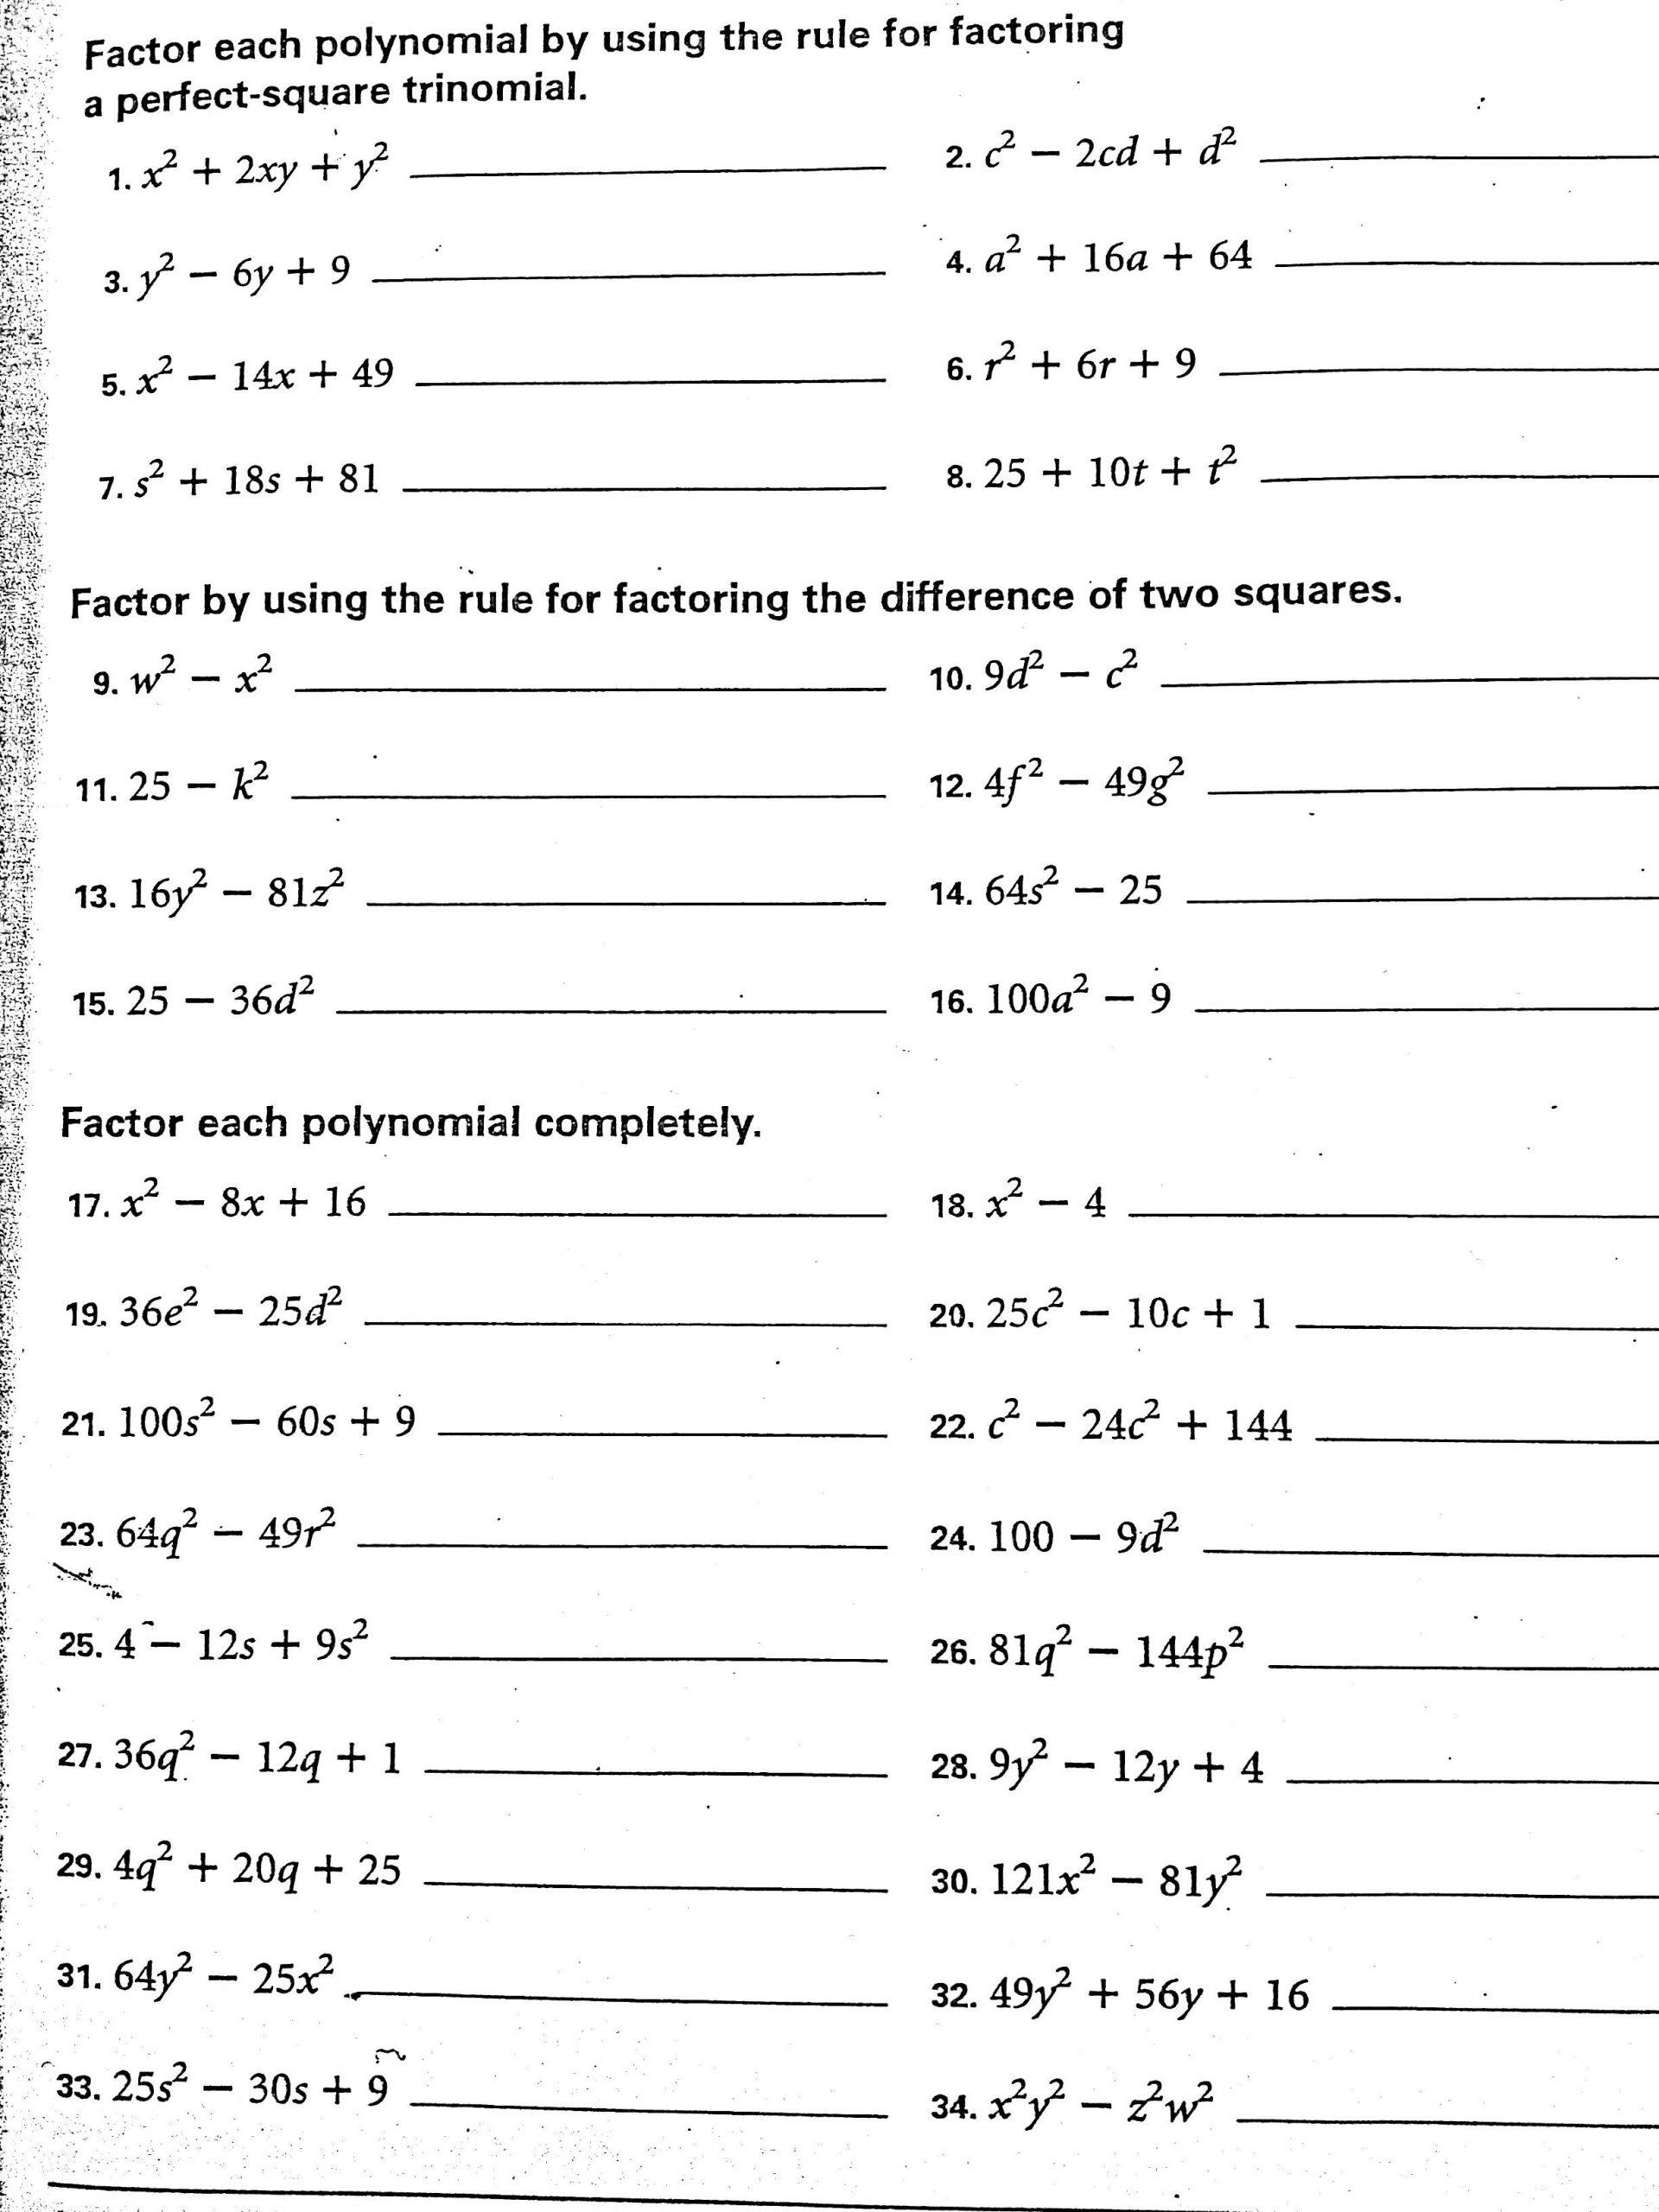 Factoring Trinomials Worksheet Algebra 2 Factoring Tricky Trinomials Worksheet